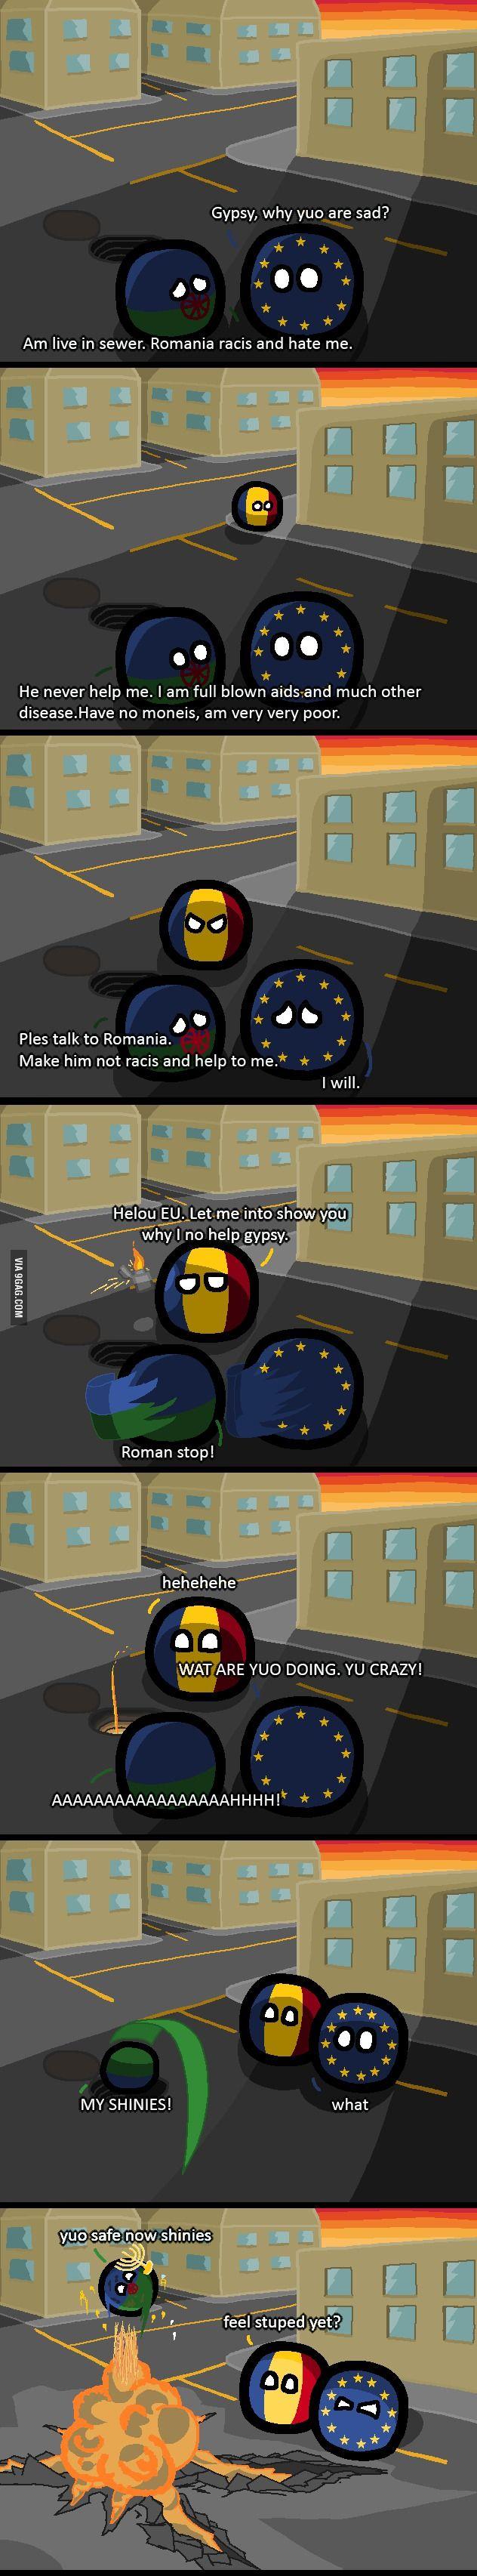 Romania racist?